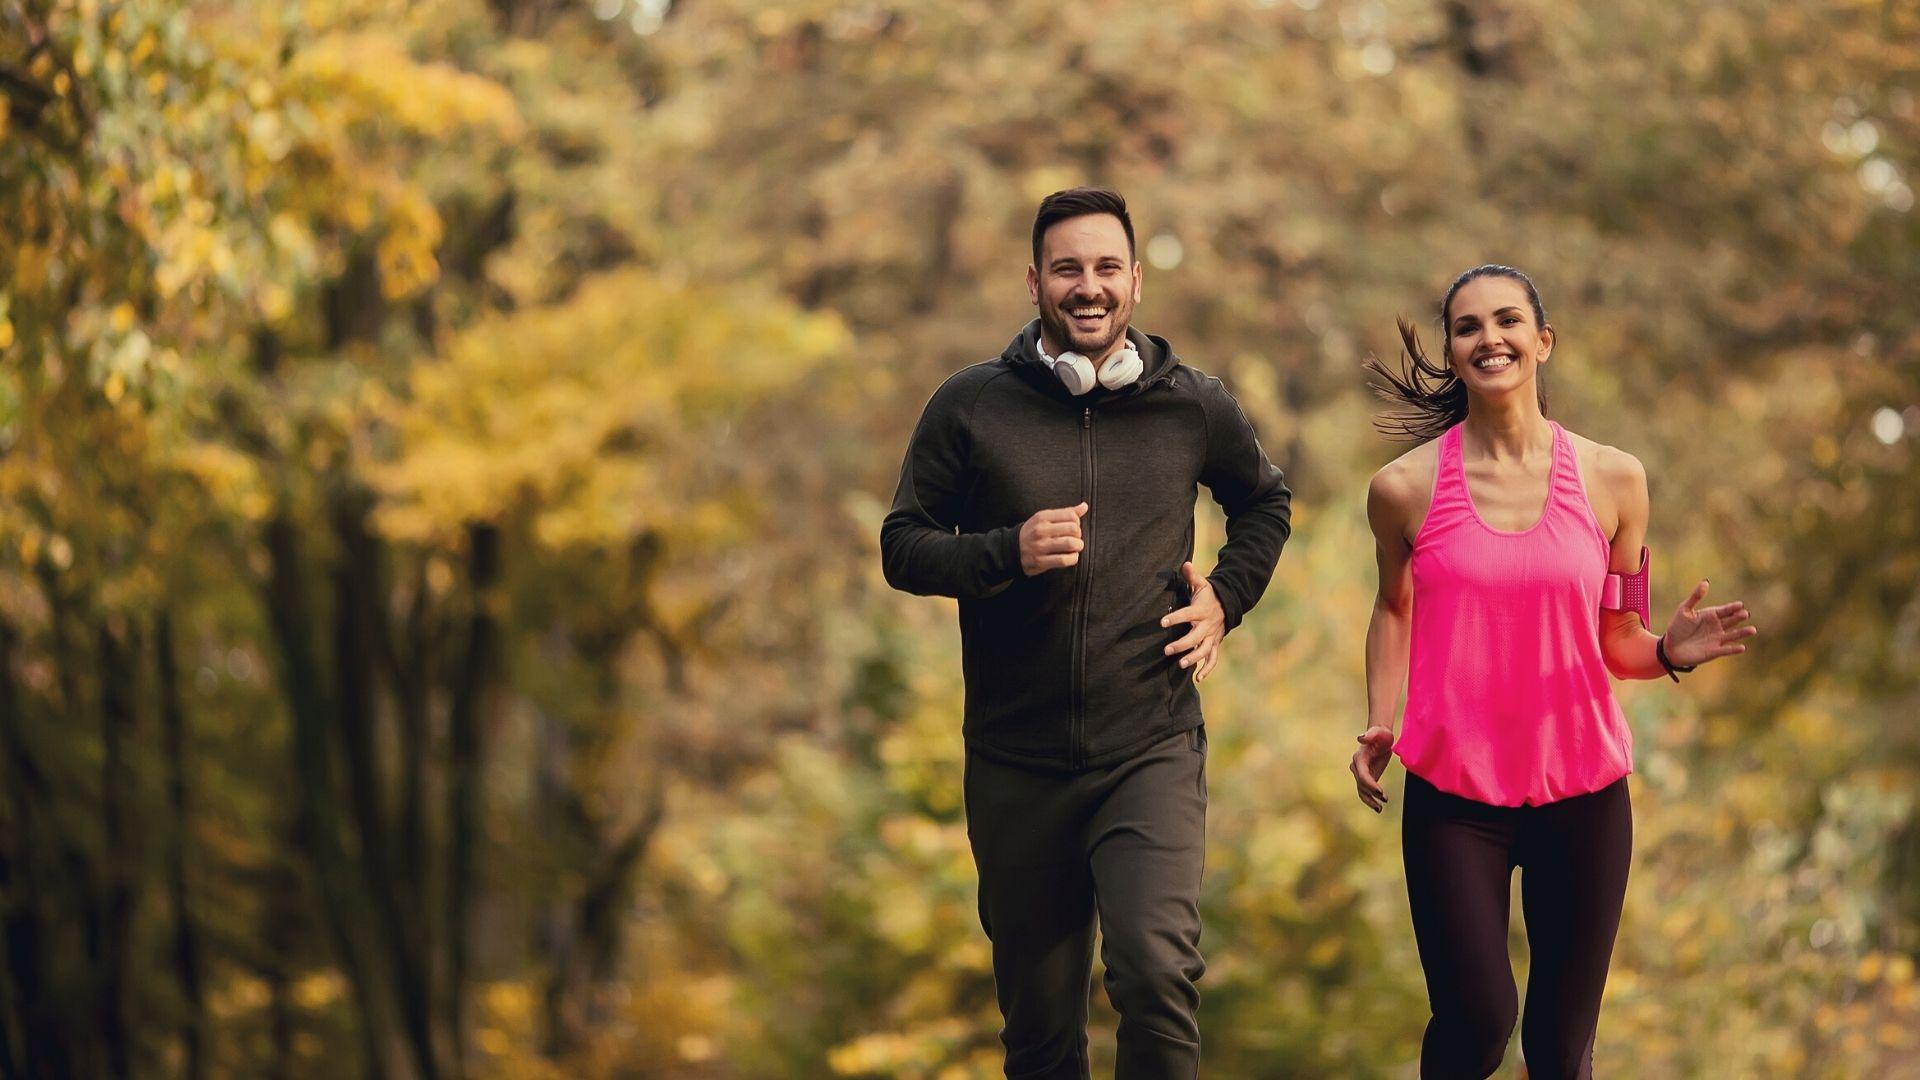 [Image: Jogging-2.jpg]